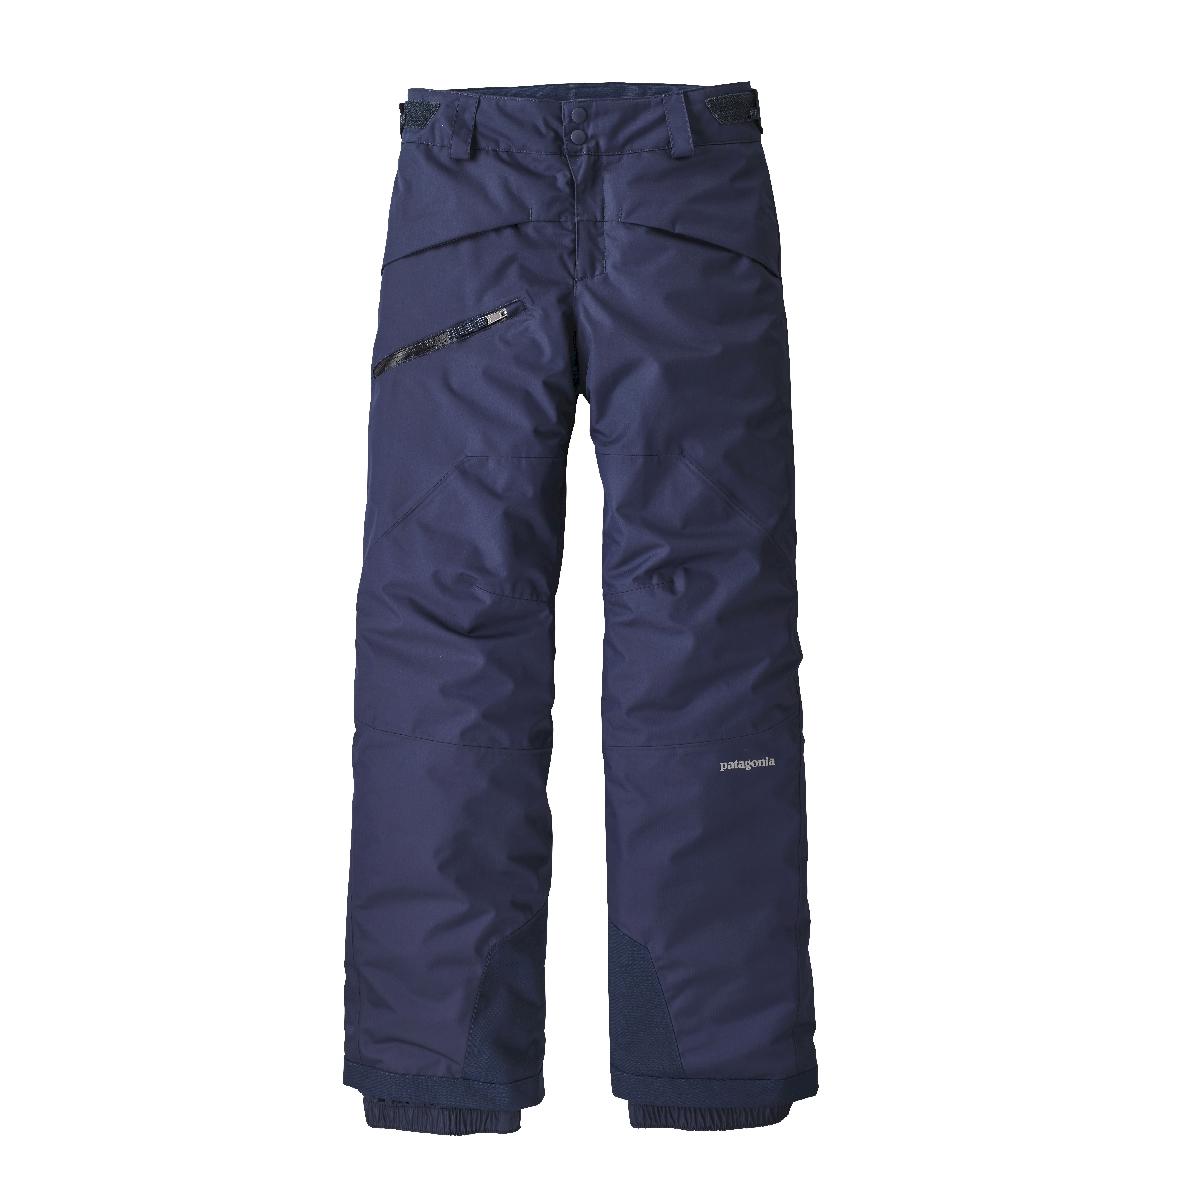 Patagonia - Boys' Snowshot Pants - Outdoor trousers - Boys